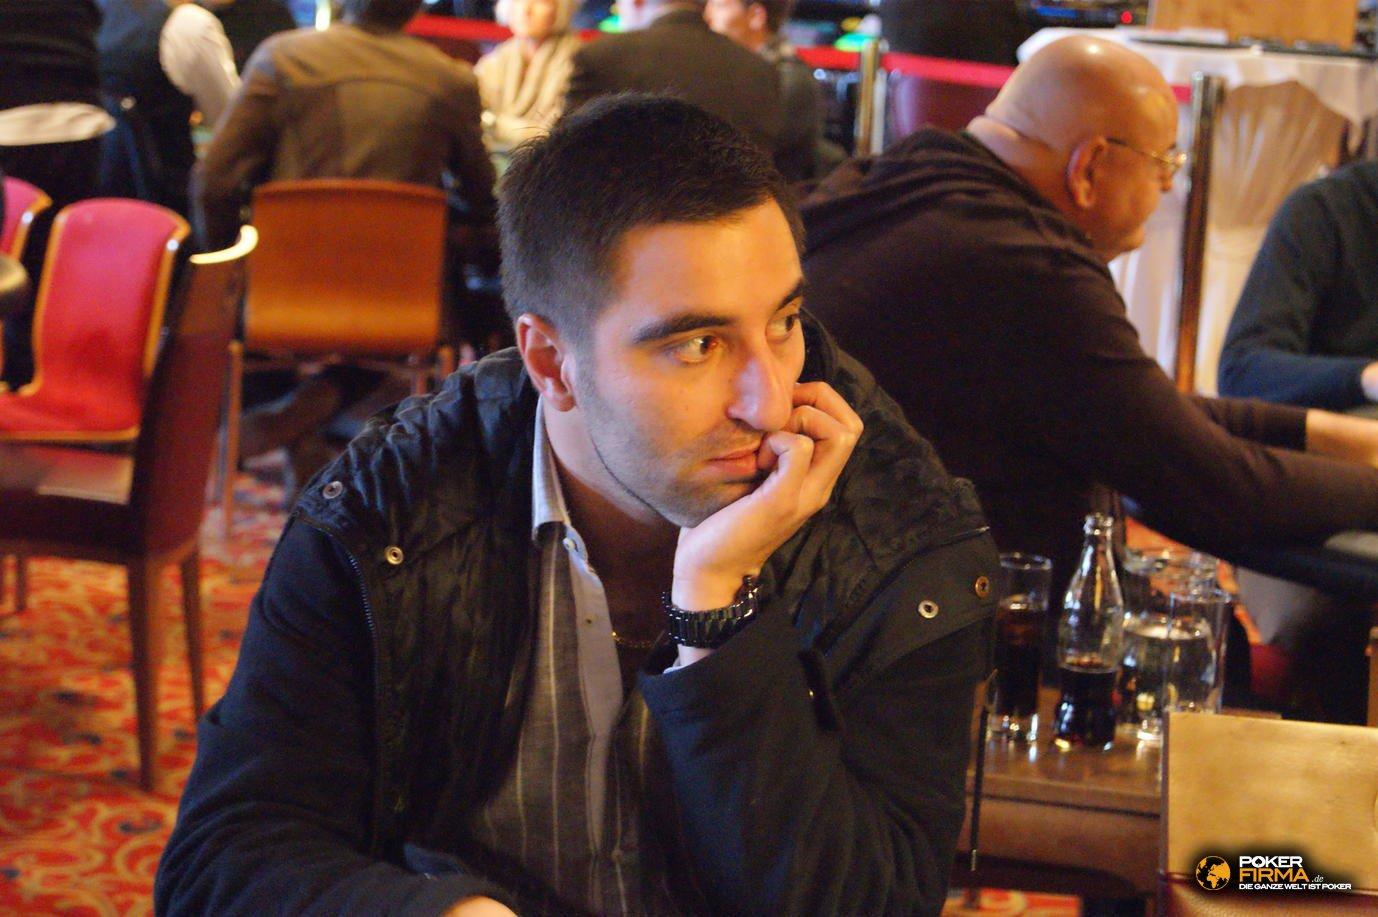 Mountain_Poker_Party_1500_NLH_081011_Domenico_Tolone